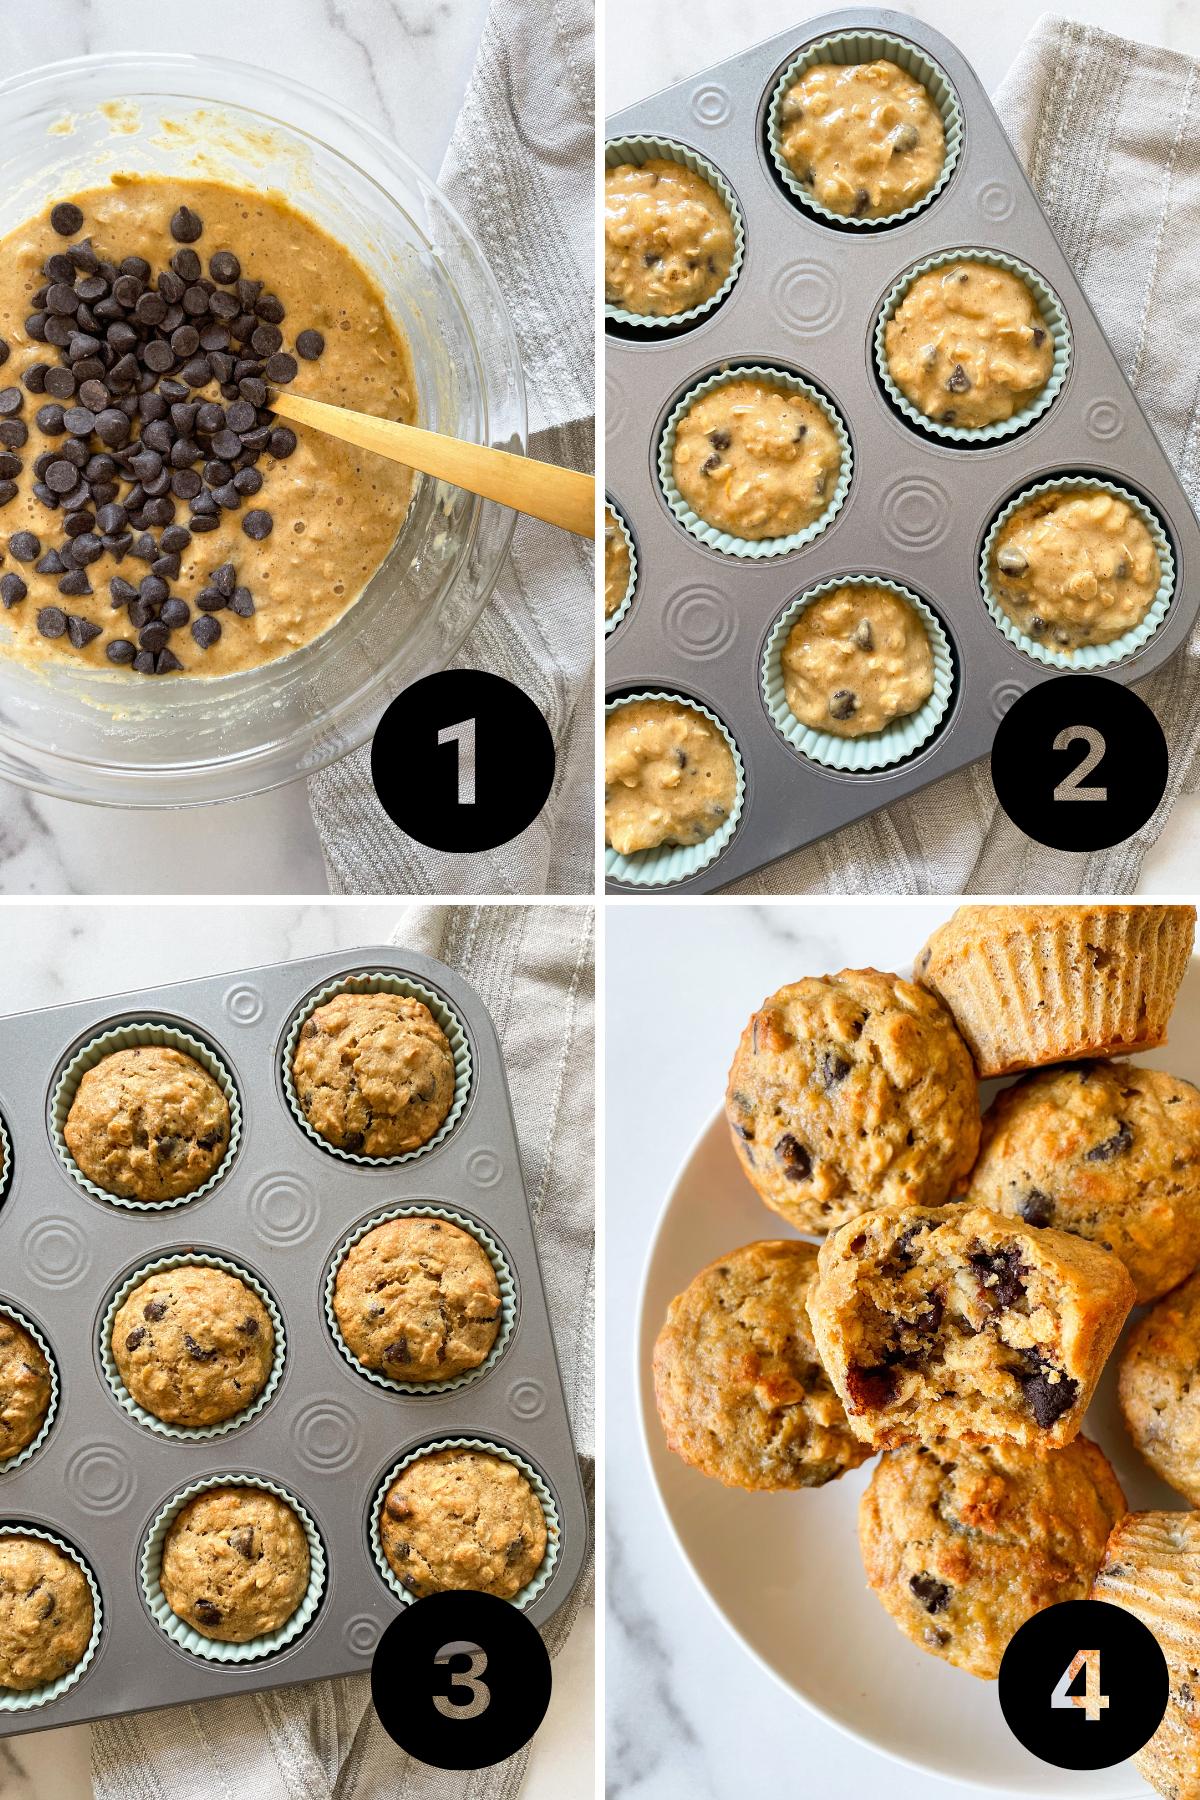 How to make Healthy Oatmeal Banana Muffins - Gluten Free & Maple-Sweetened